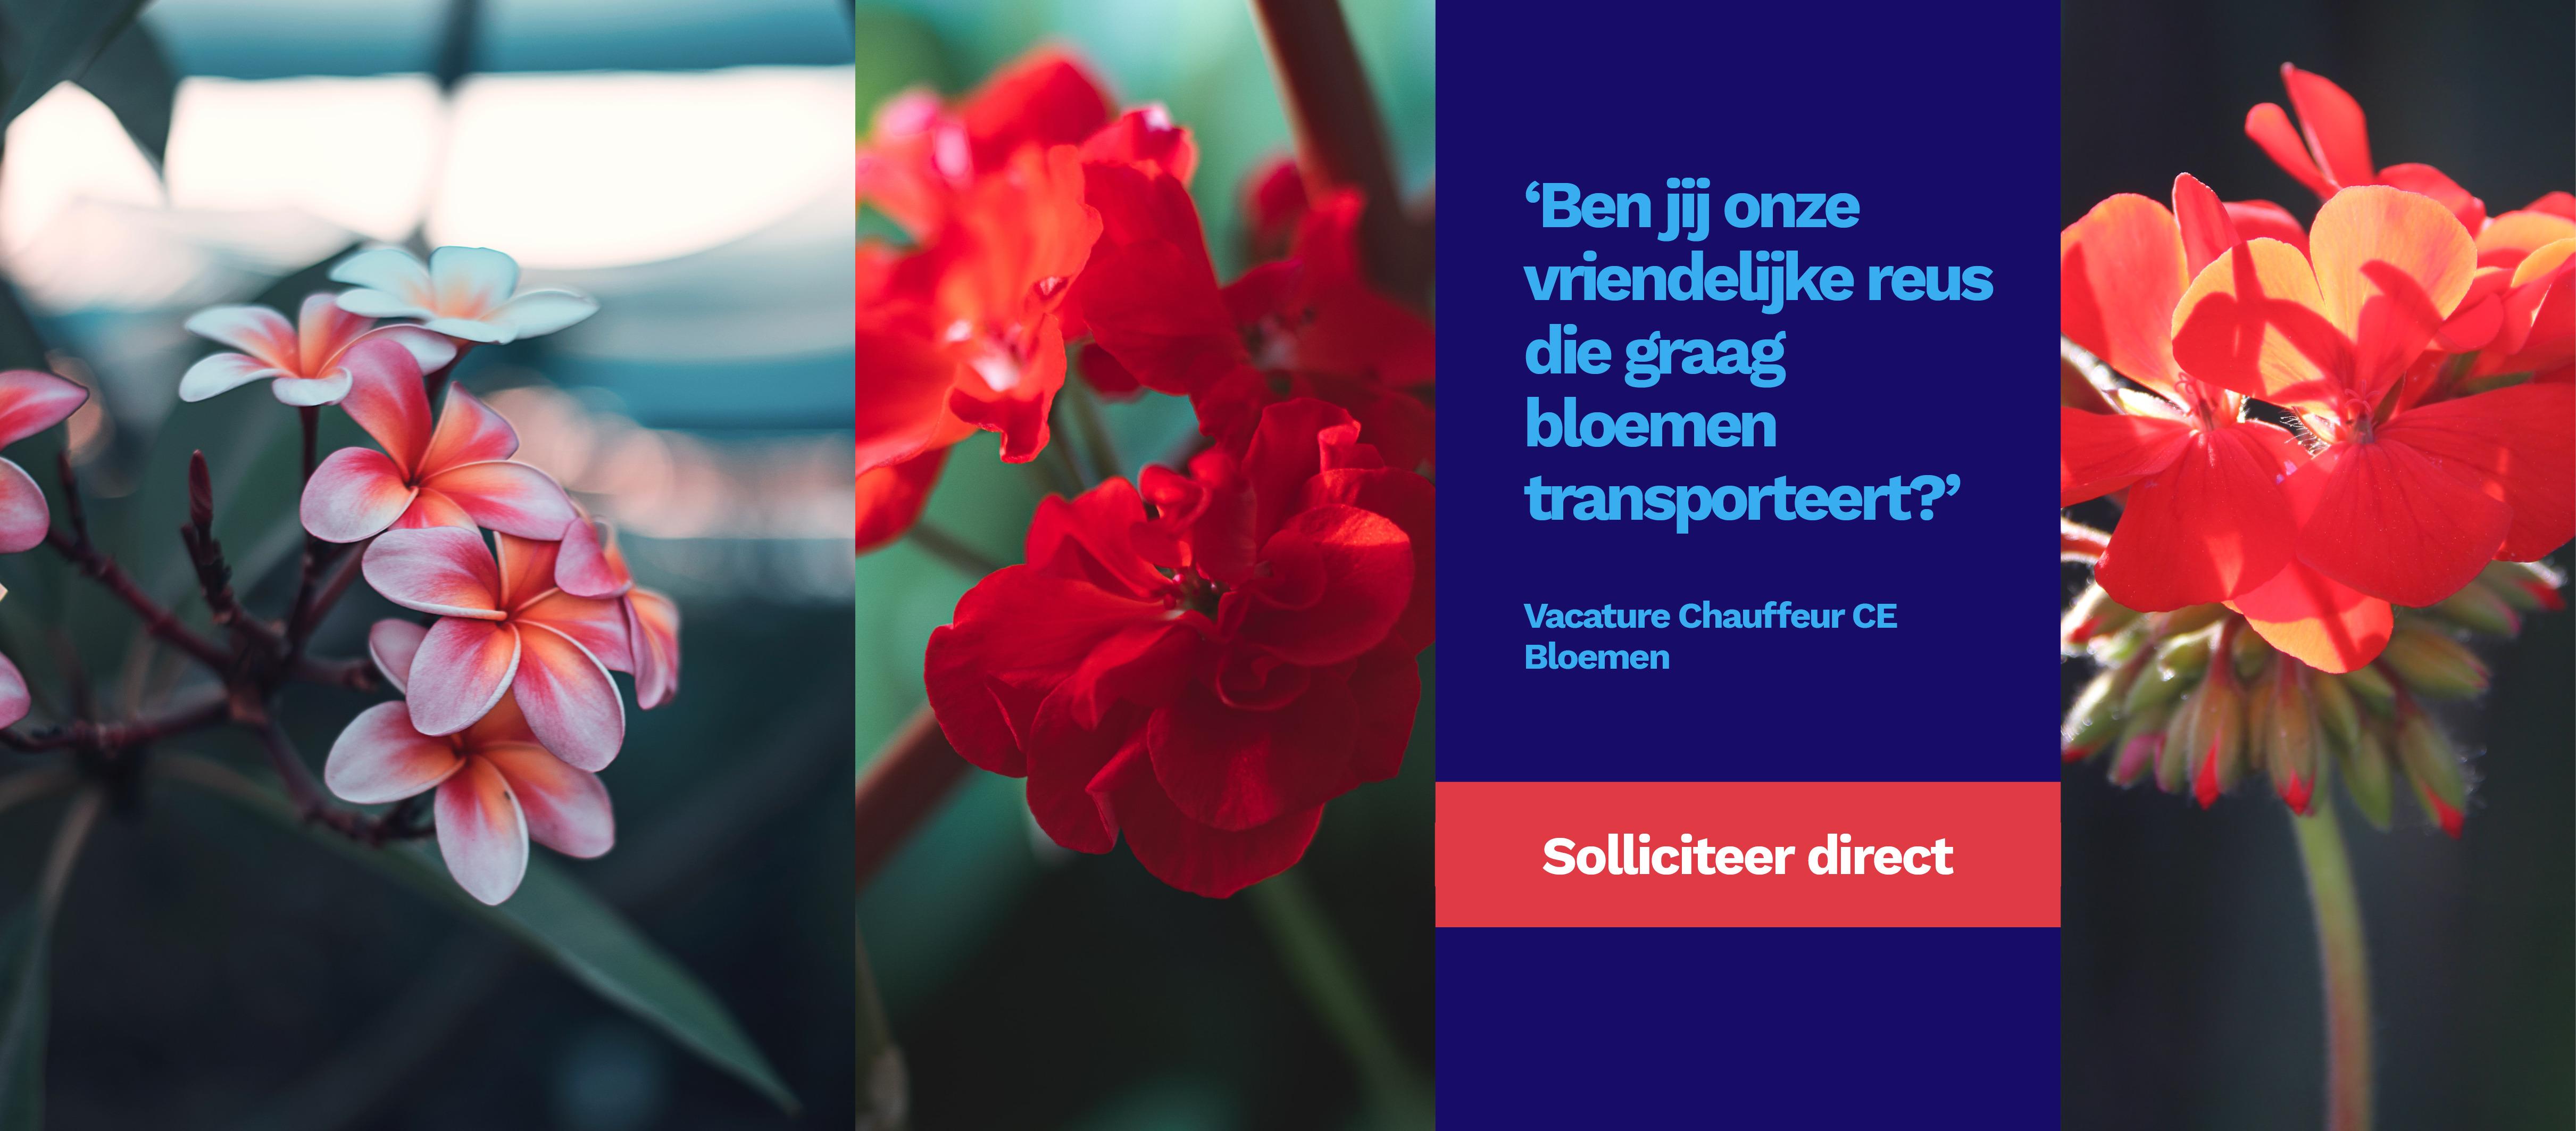 Chauffeur Nationaal Bloemen Mijdrecht